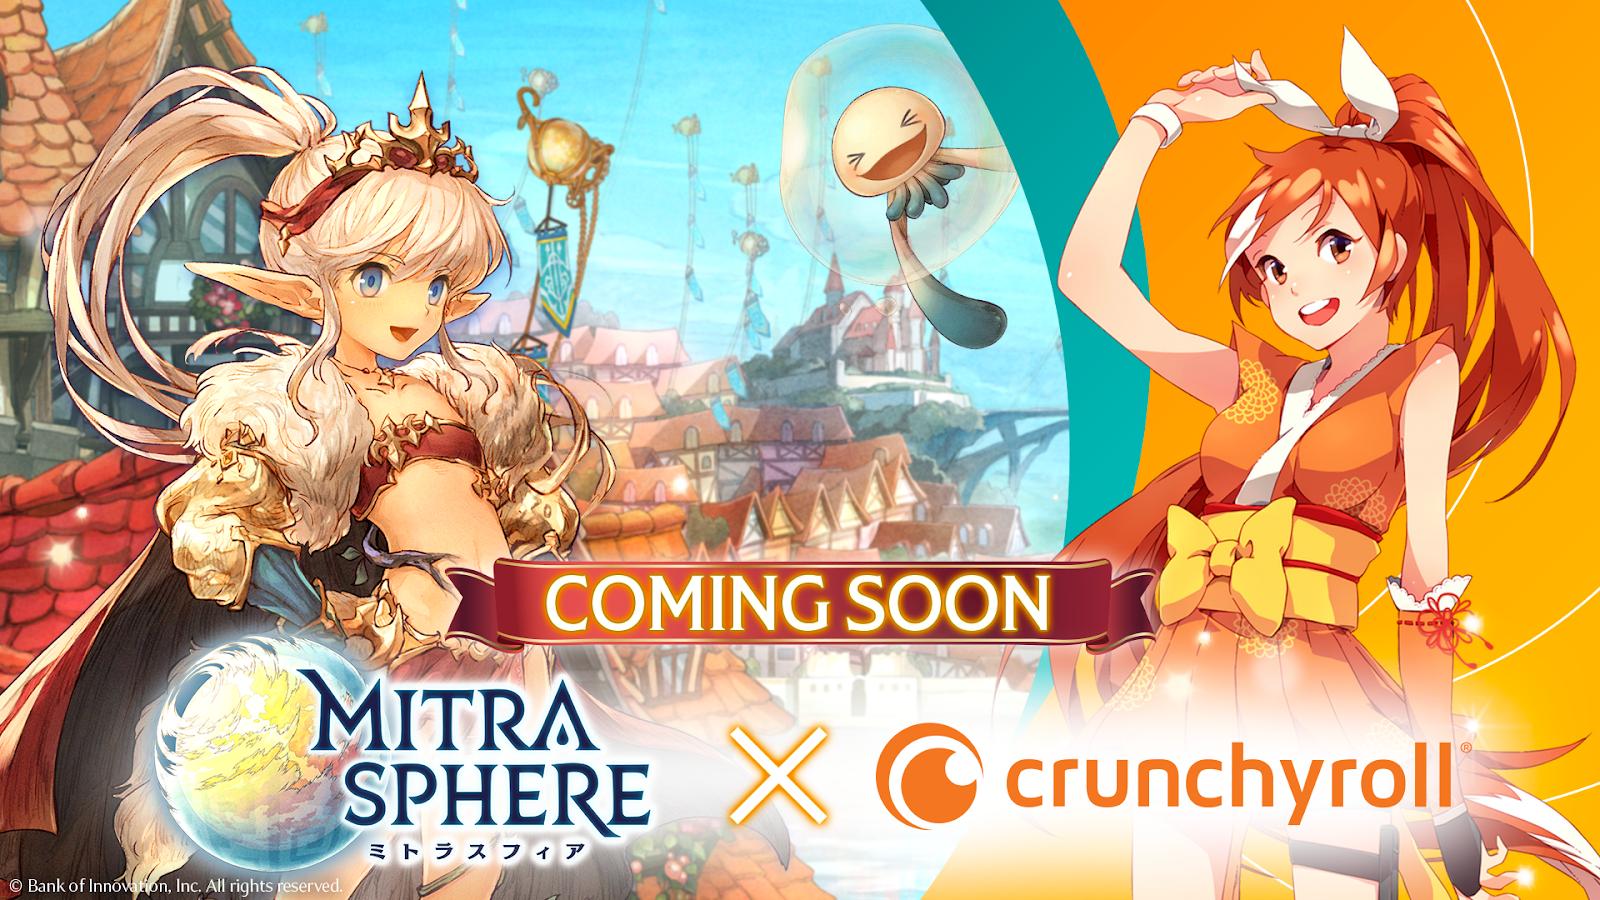 Crunchyroll-Hime x Mitrasphere